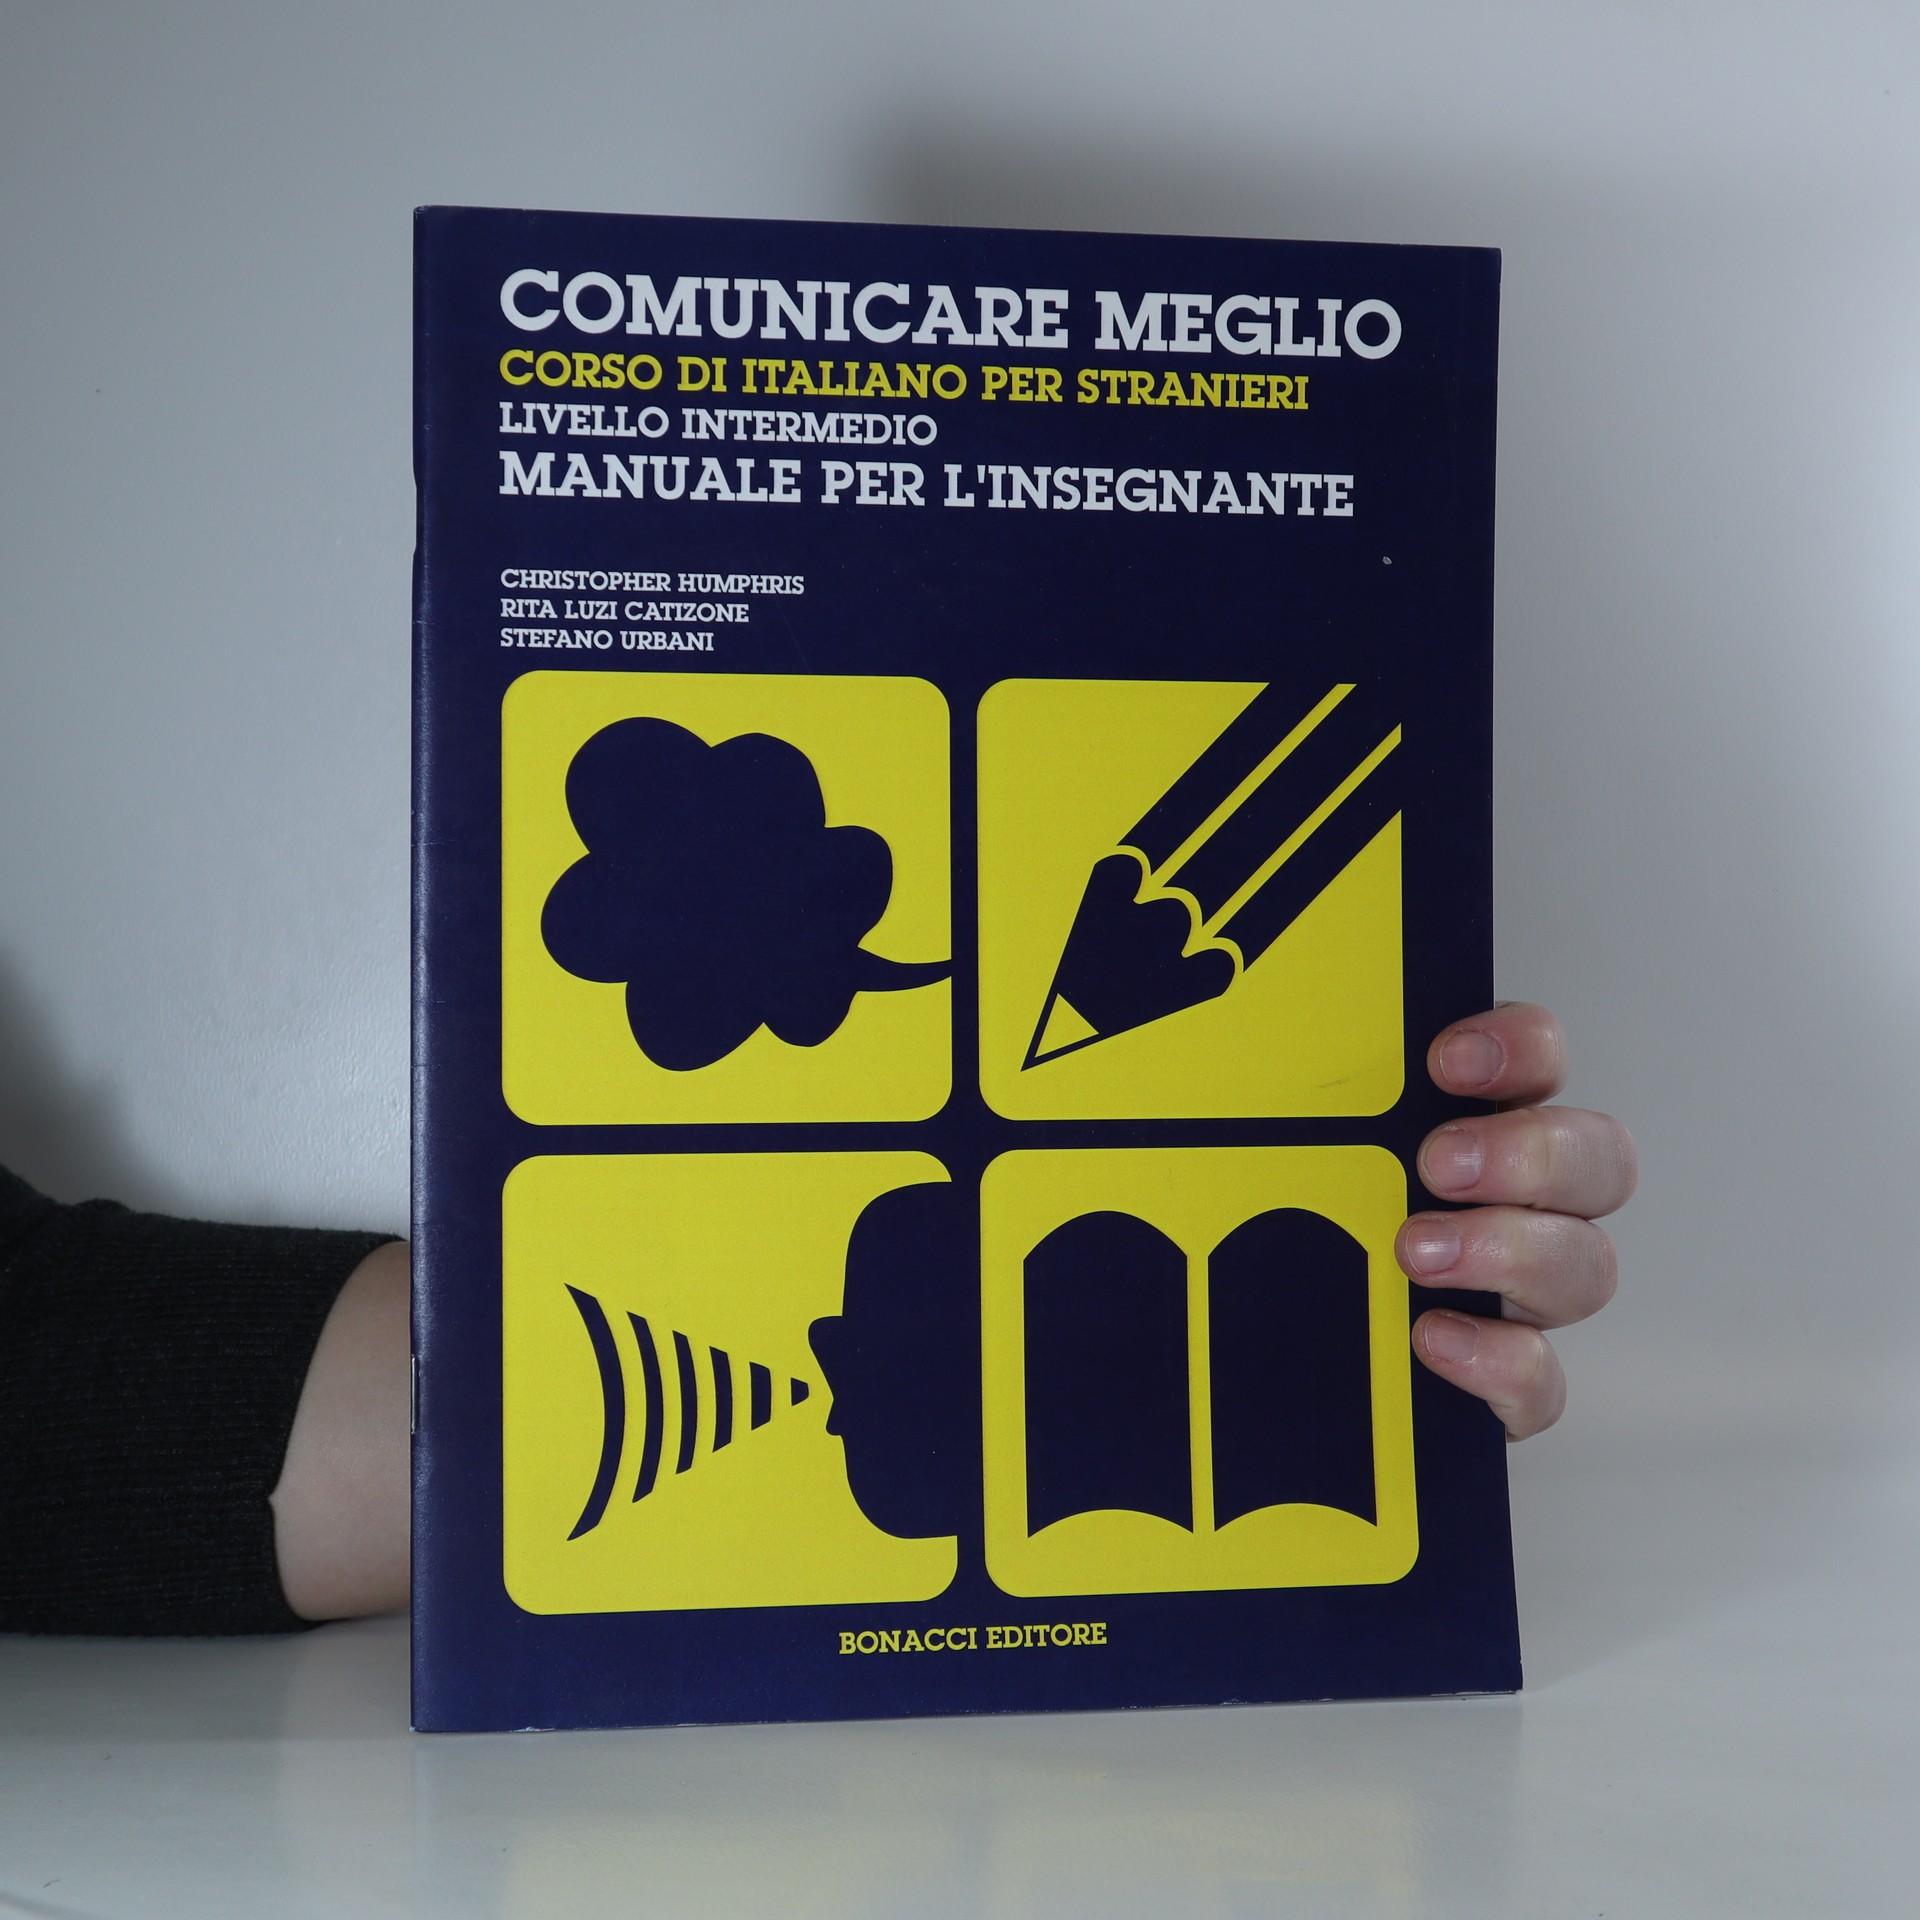 antikvární kniha Comunicare meglio, 1993